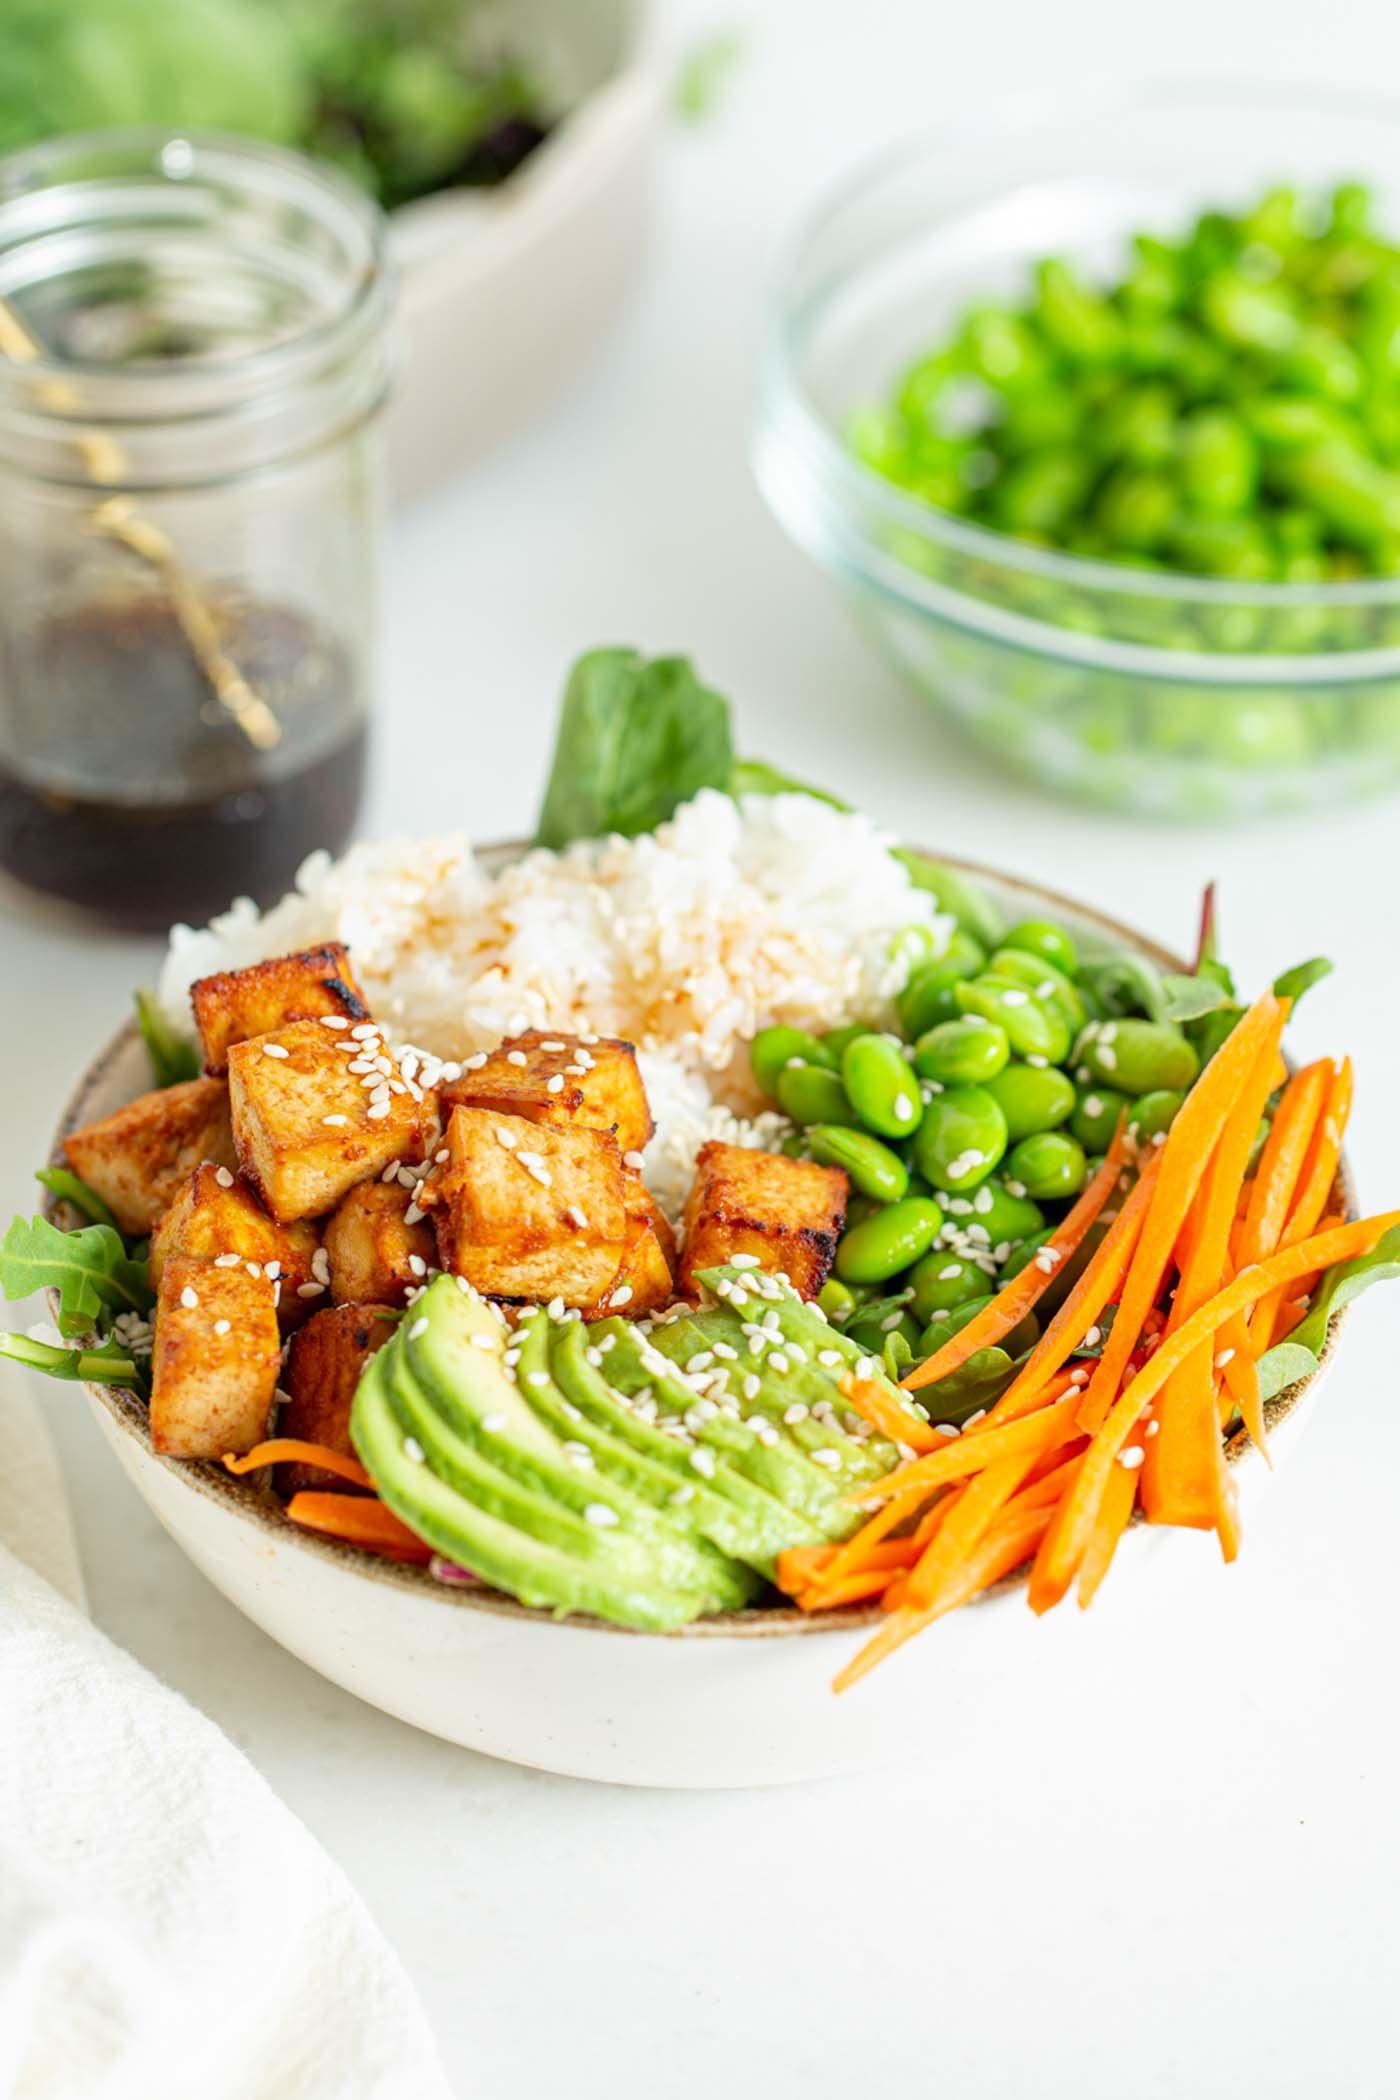 Sriracha Baked Tofu Rice Bowls Recipe In 2020 Rice Bowls Recipes Baked Tofu Healthy Plant Based Recipes